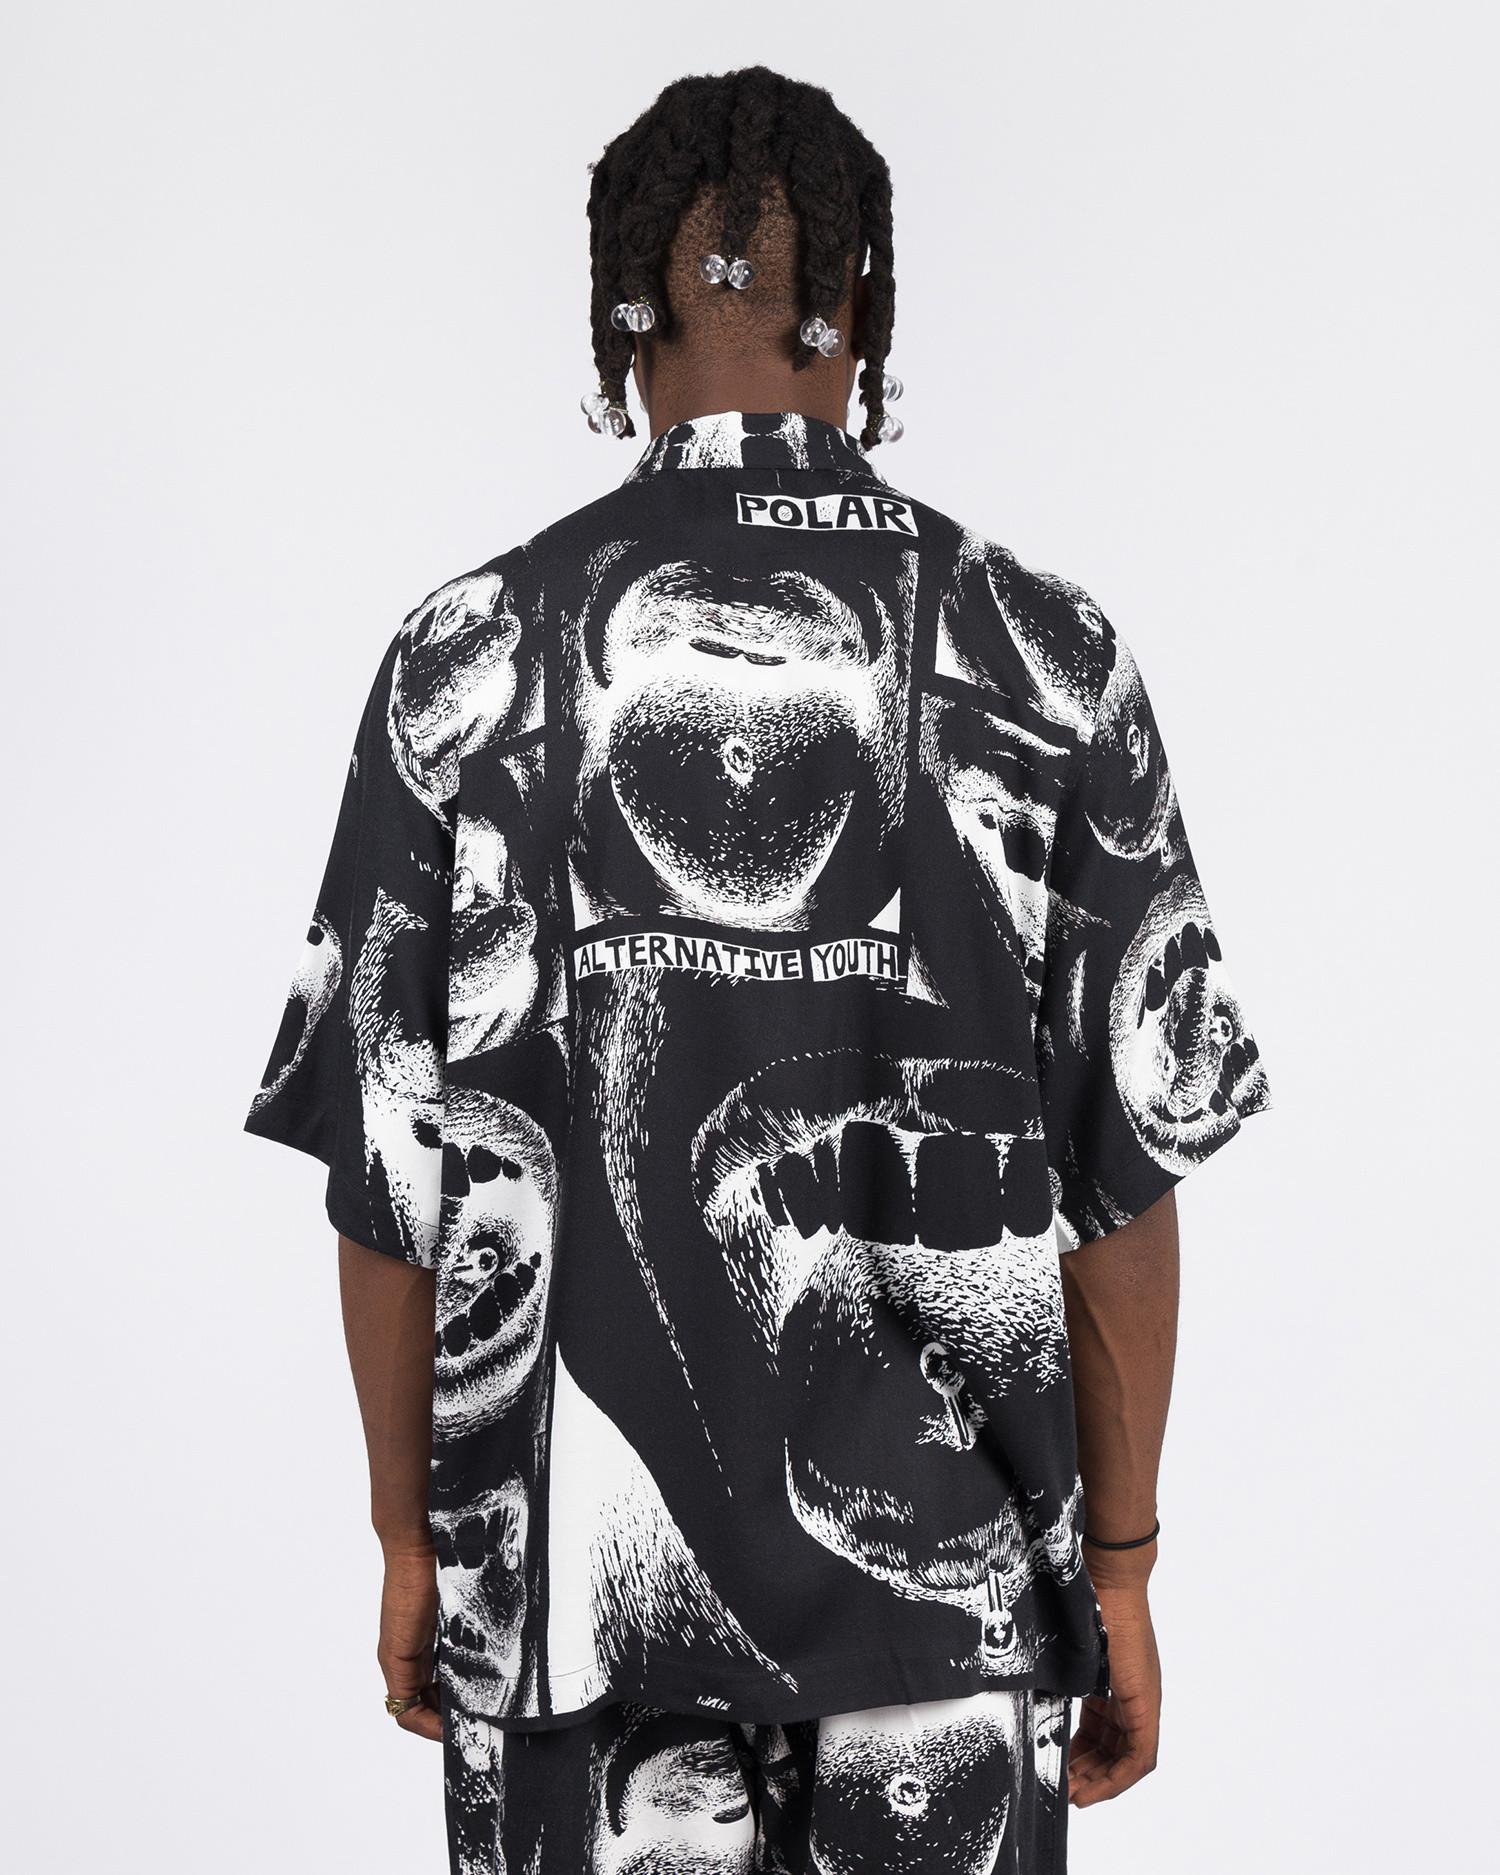 Polar X Iggy Alternative Youth Shirt Black